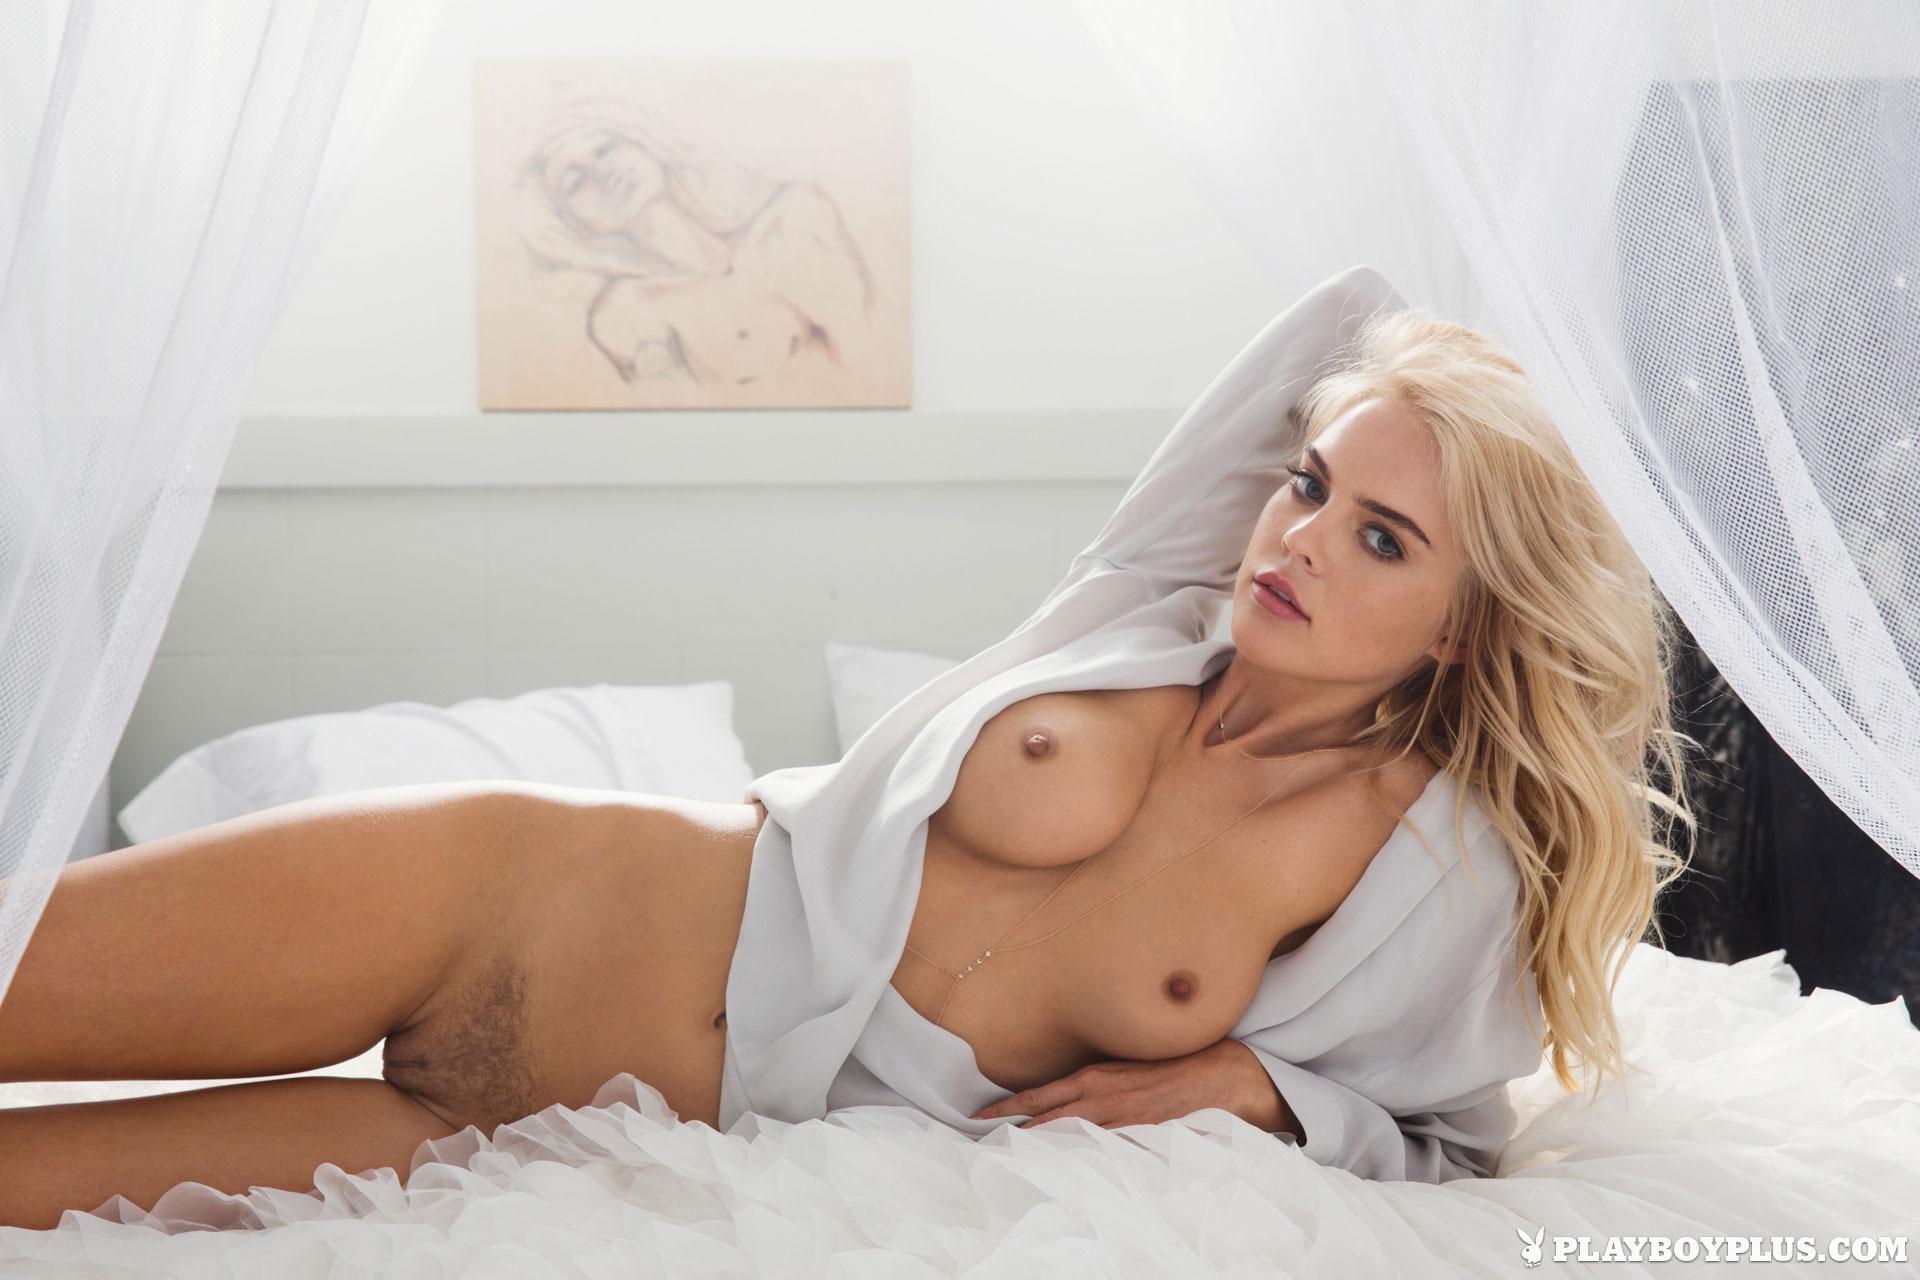 full length hd porn videos download